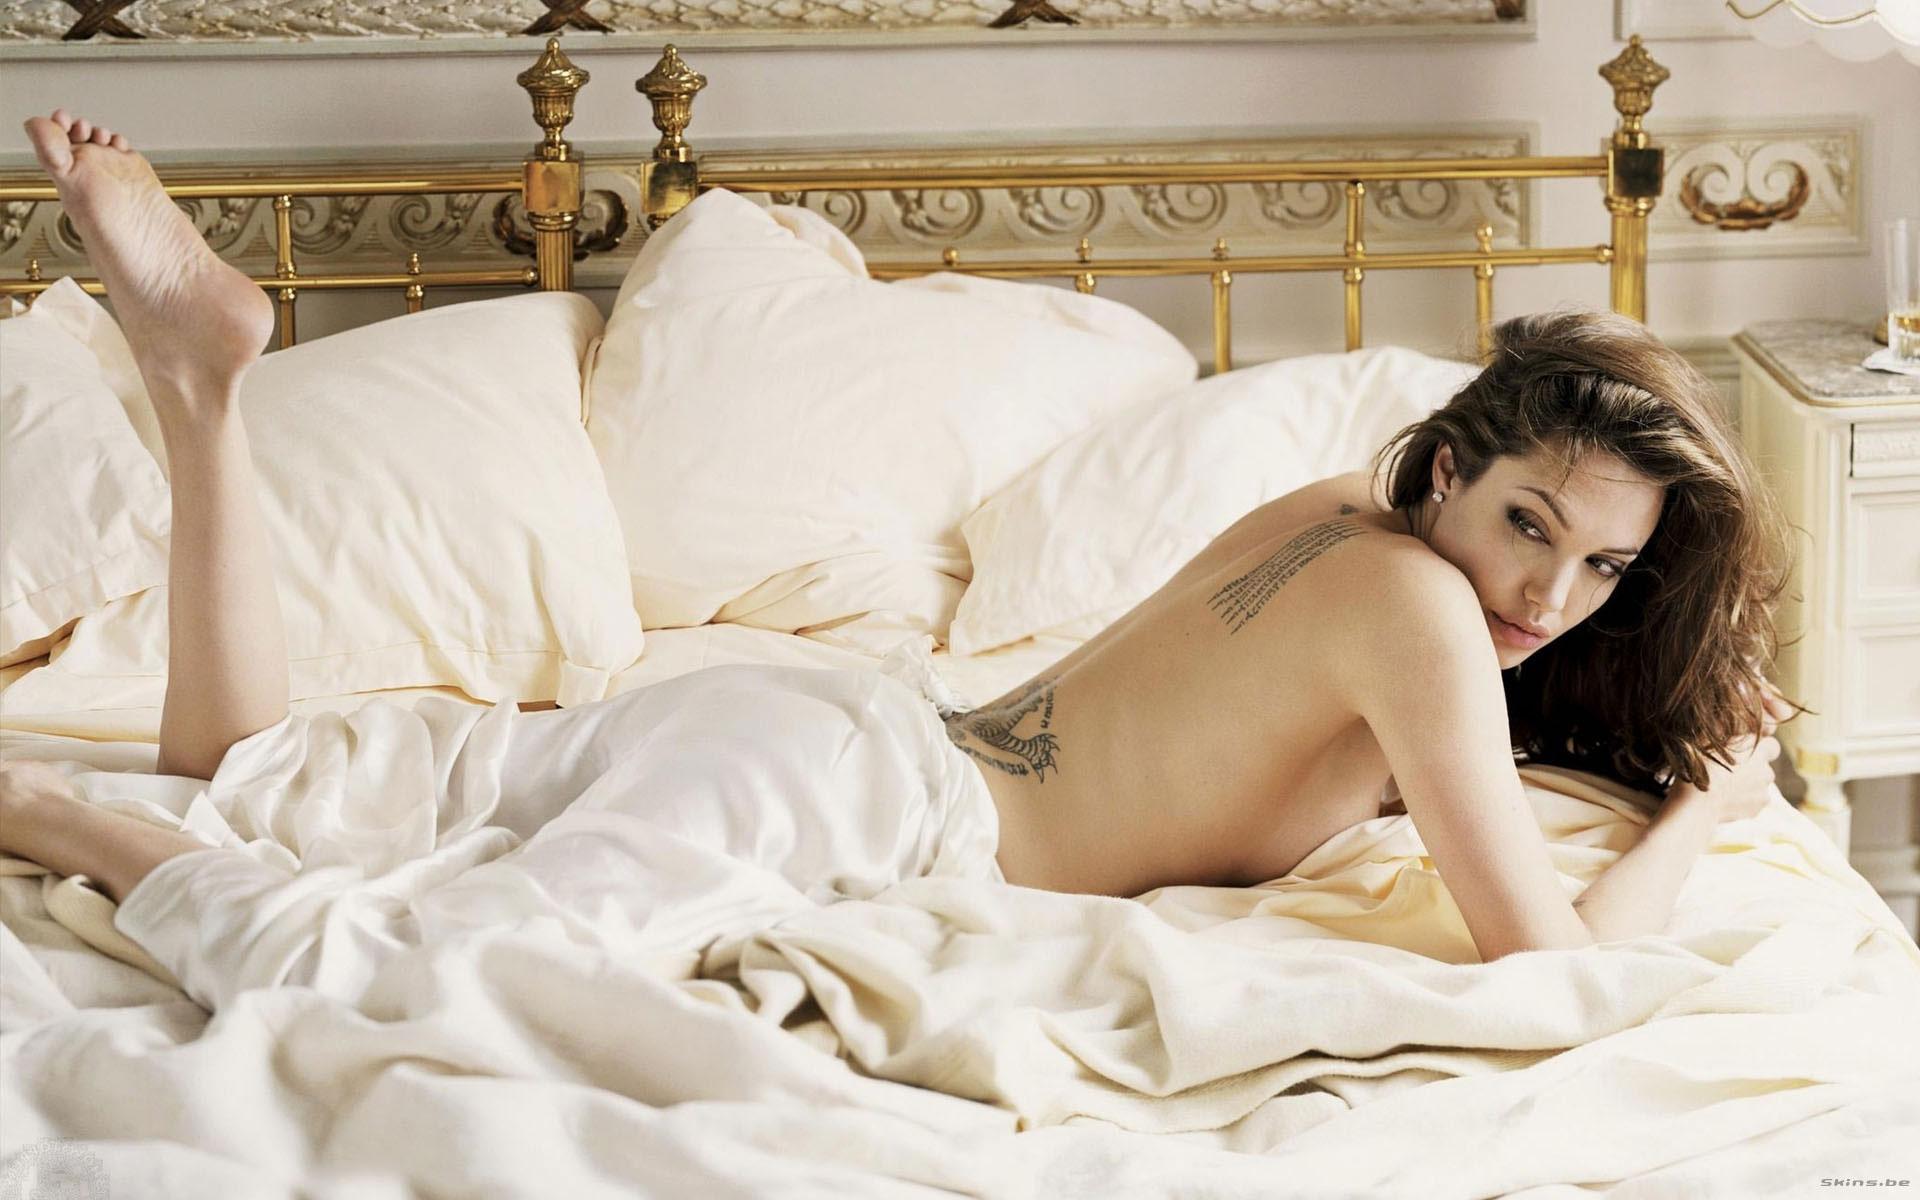 Bons Rapazes Angelina Jolie 40 anos 1